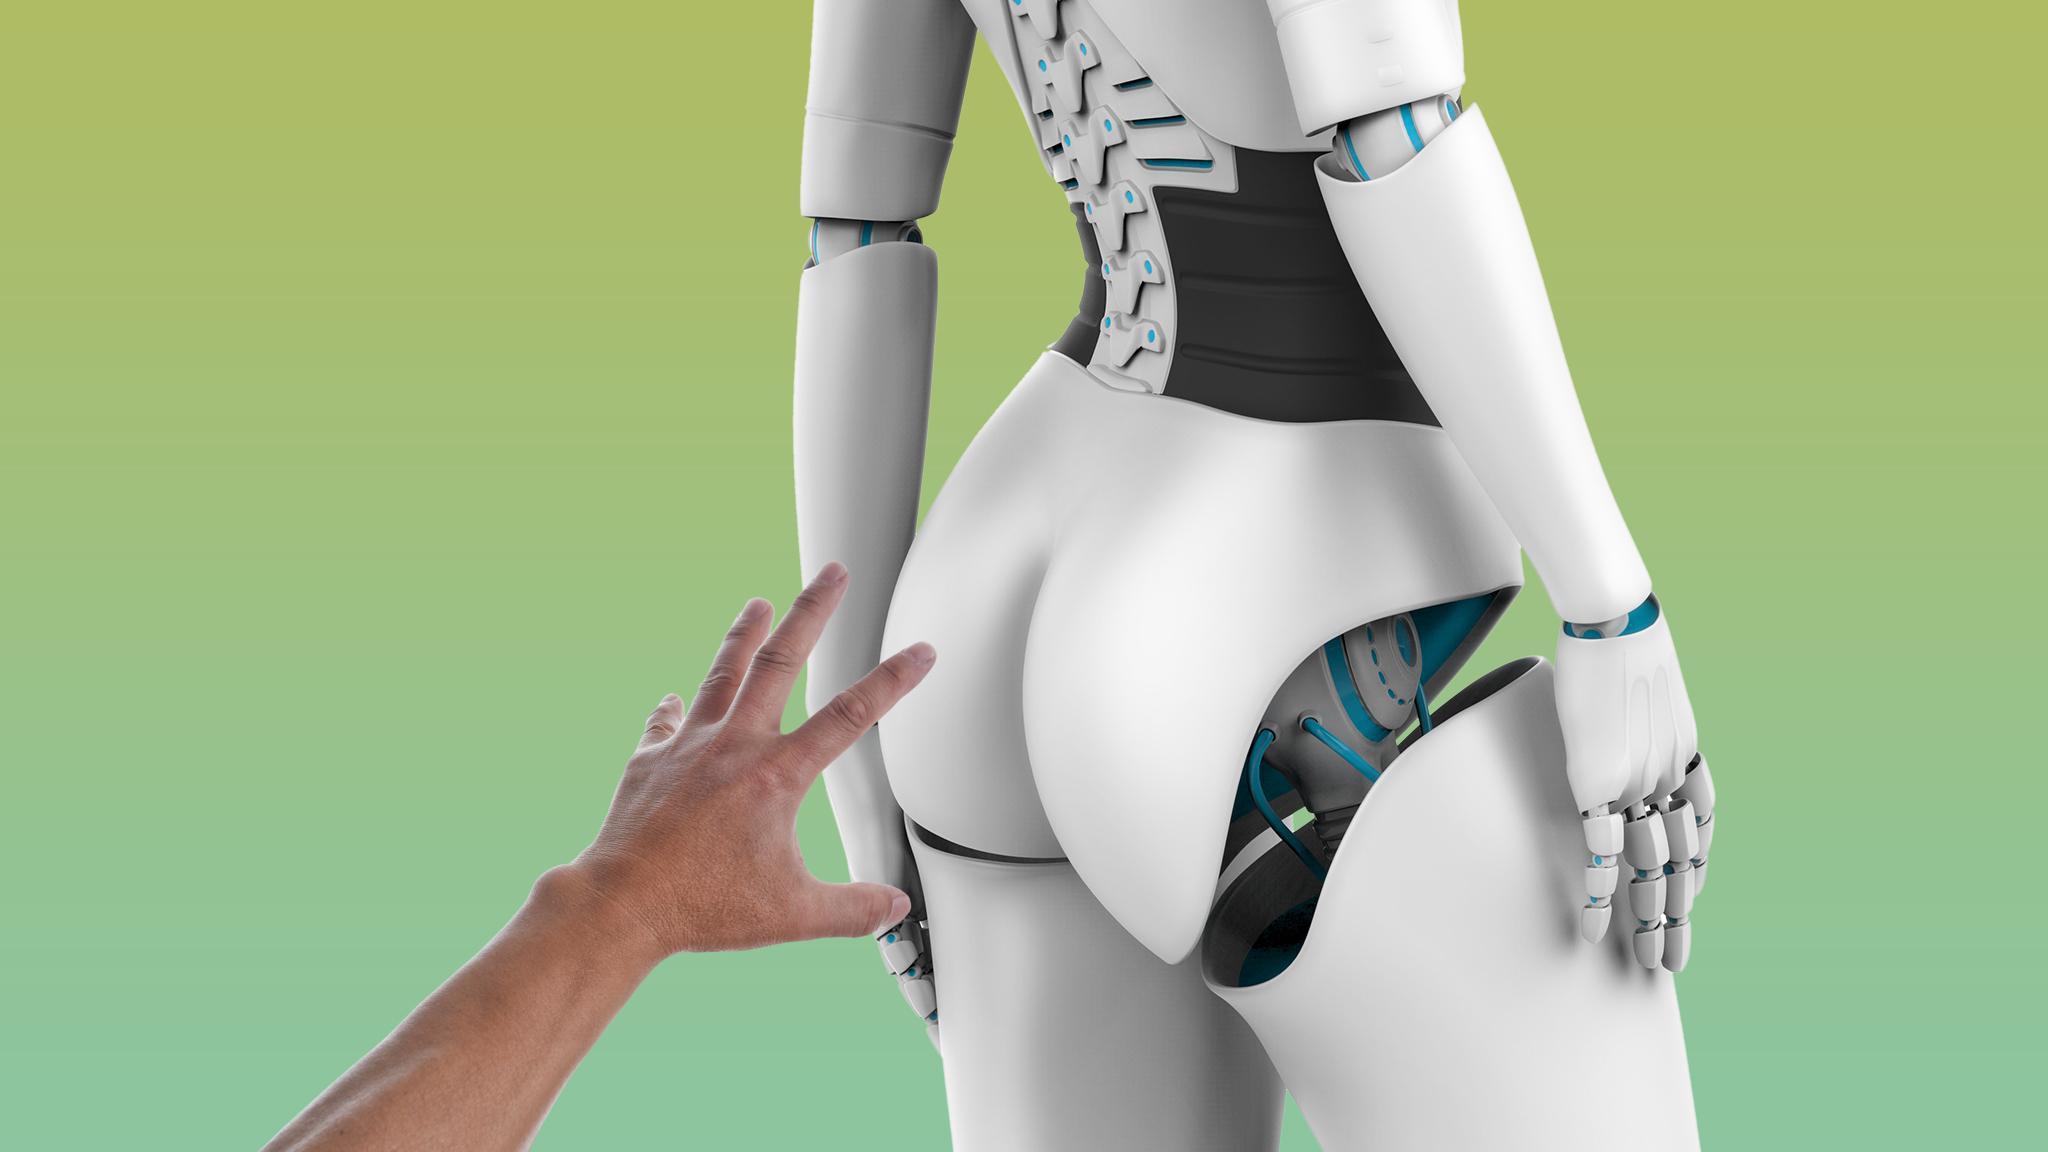 Робот трахает бабу считаю